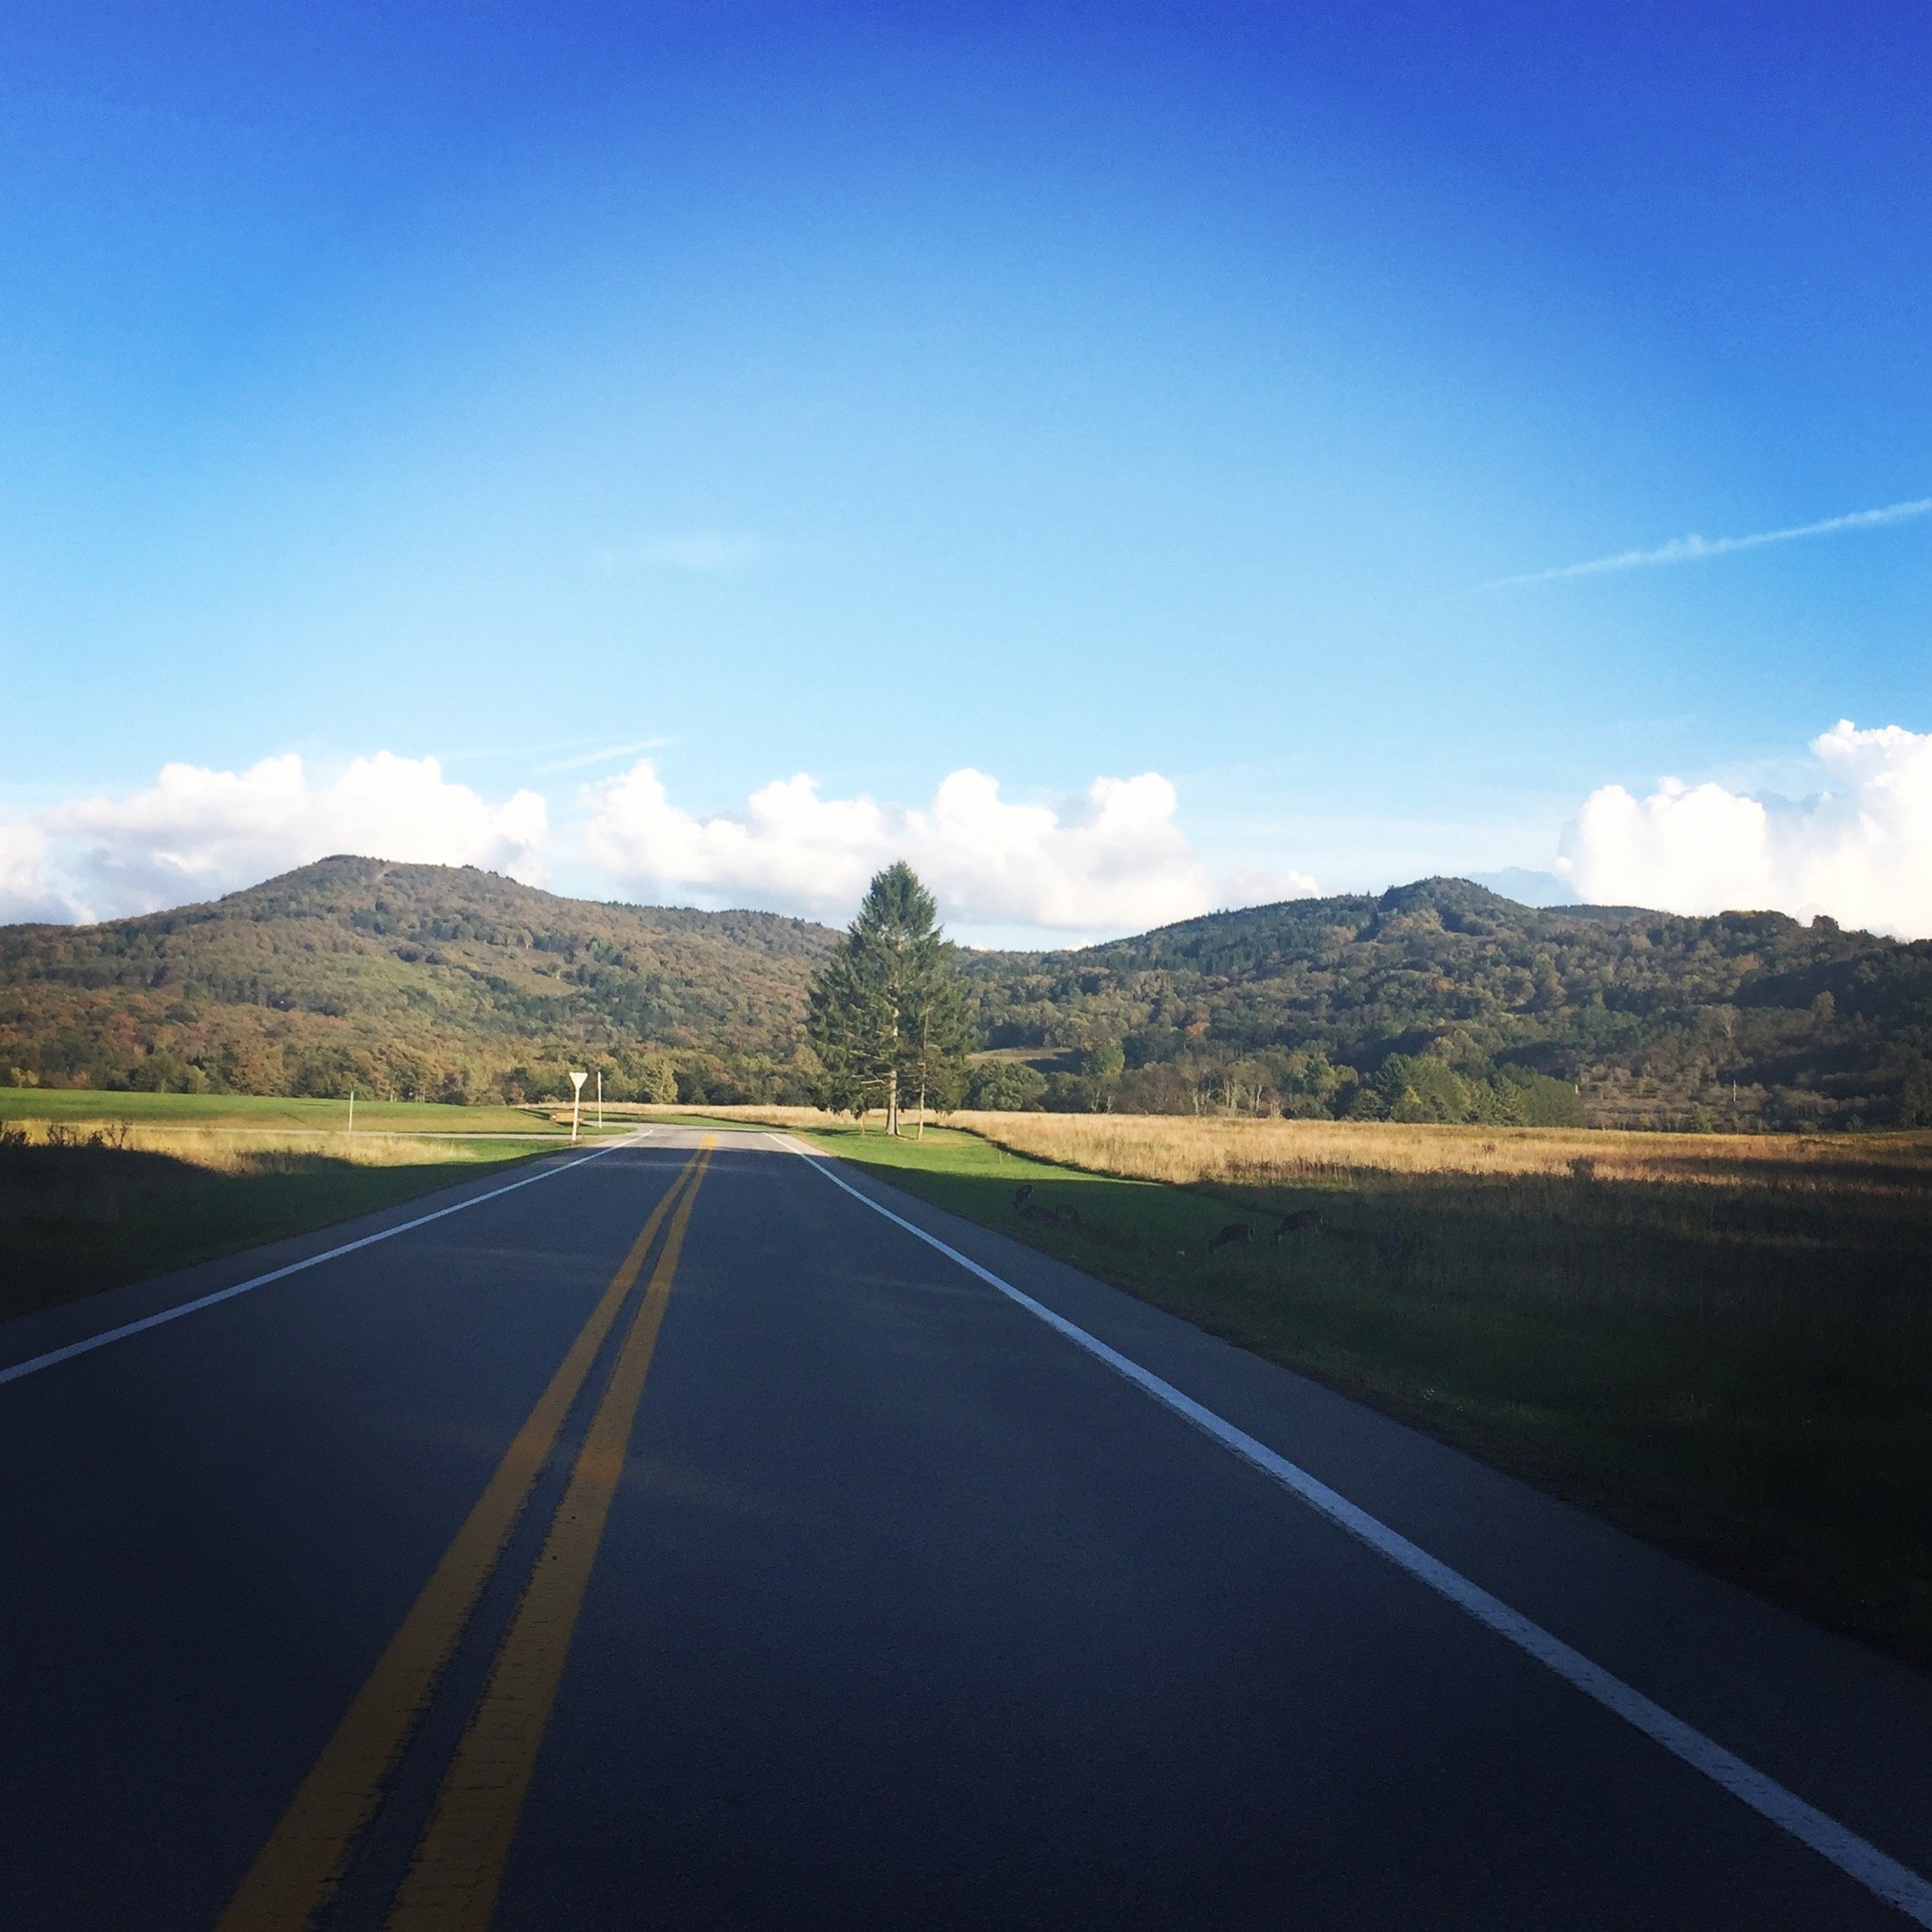 Canaan Valley views where Q & A Associates has their programs.